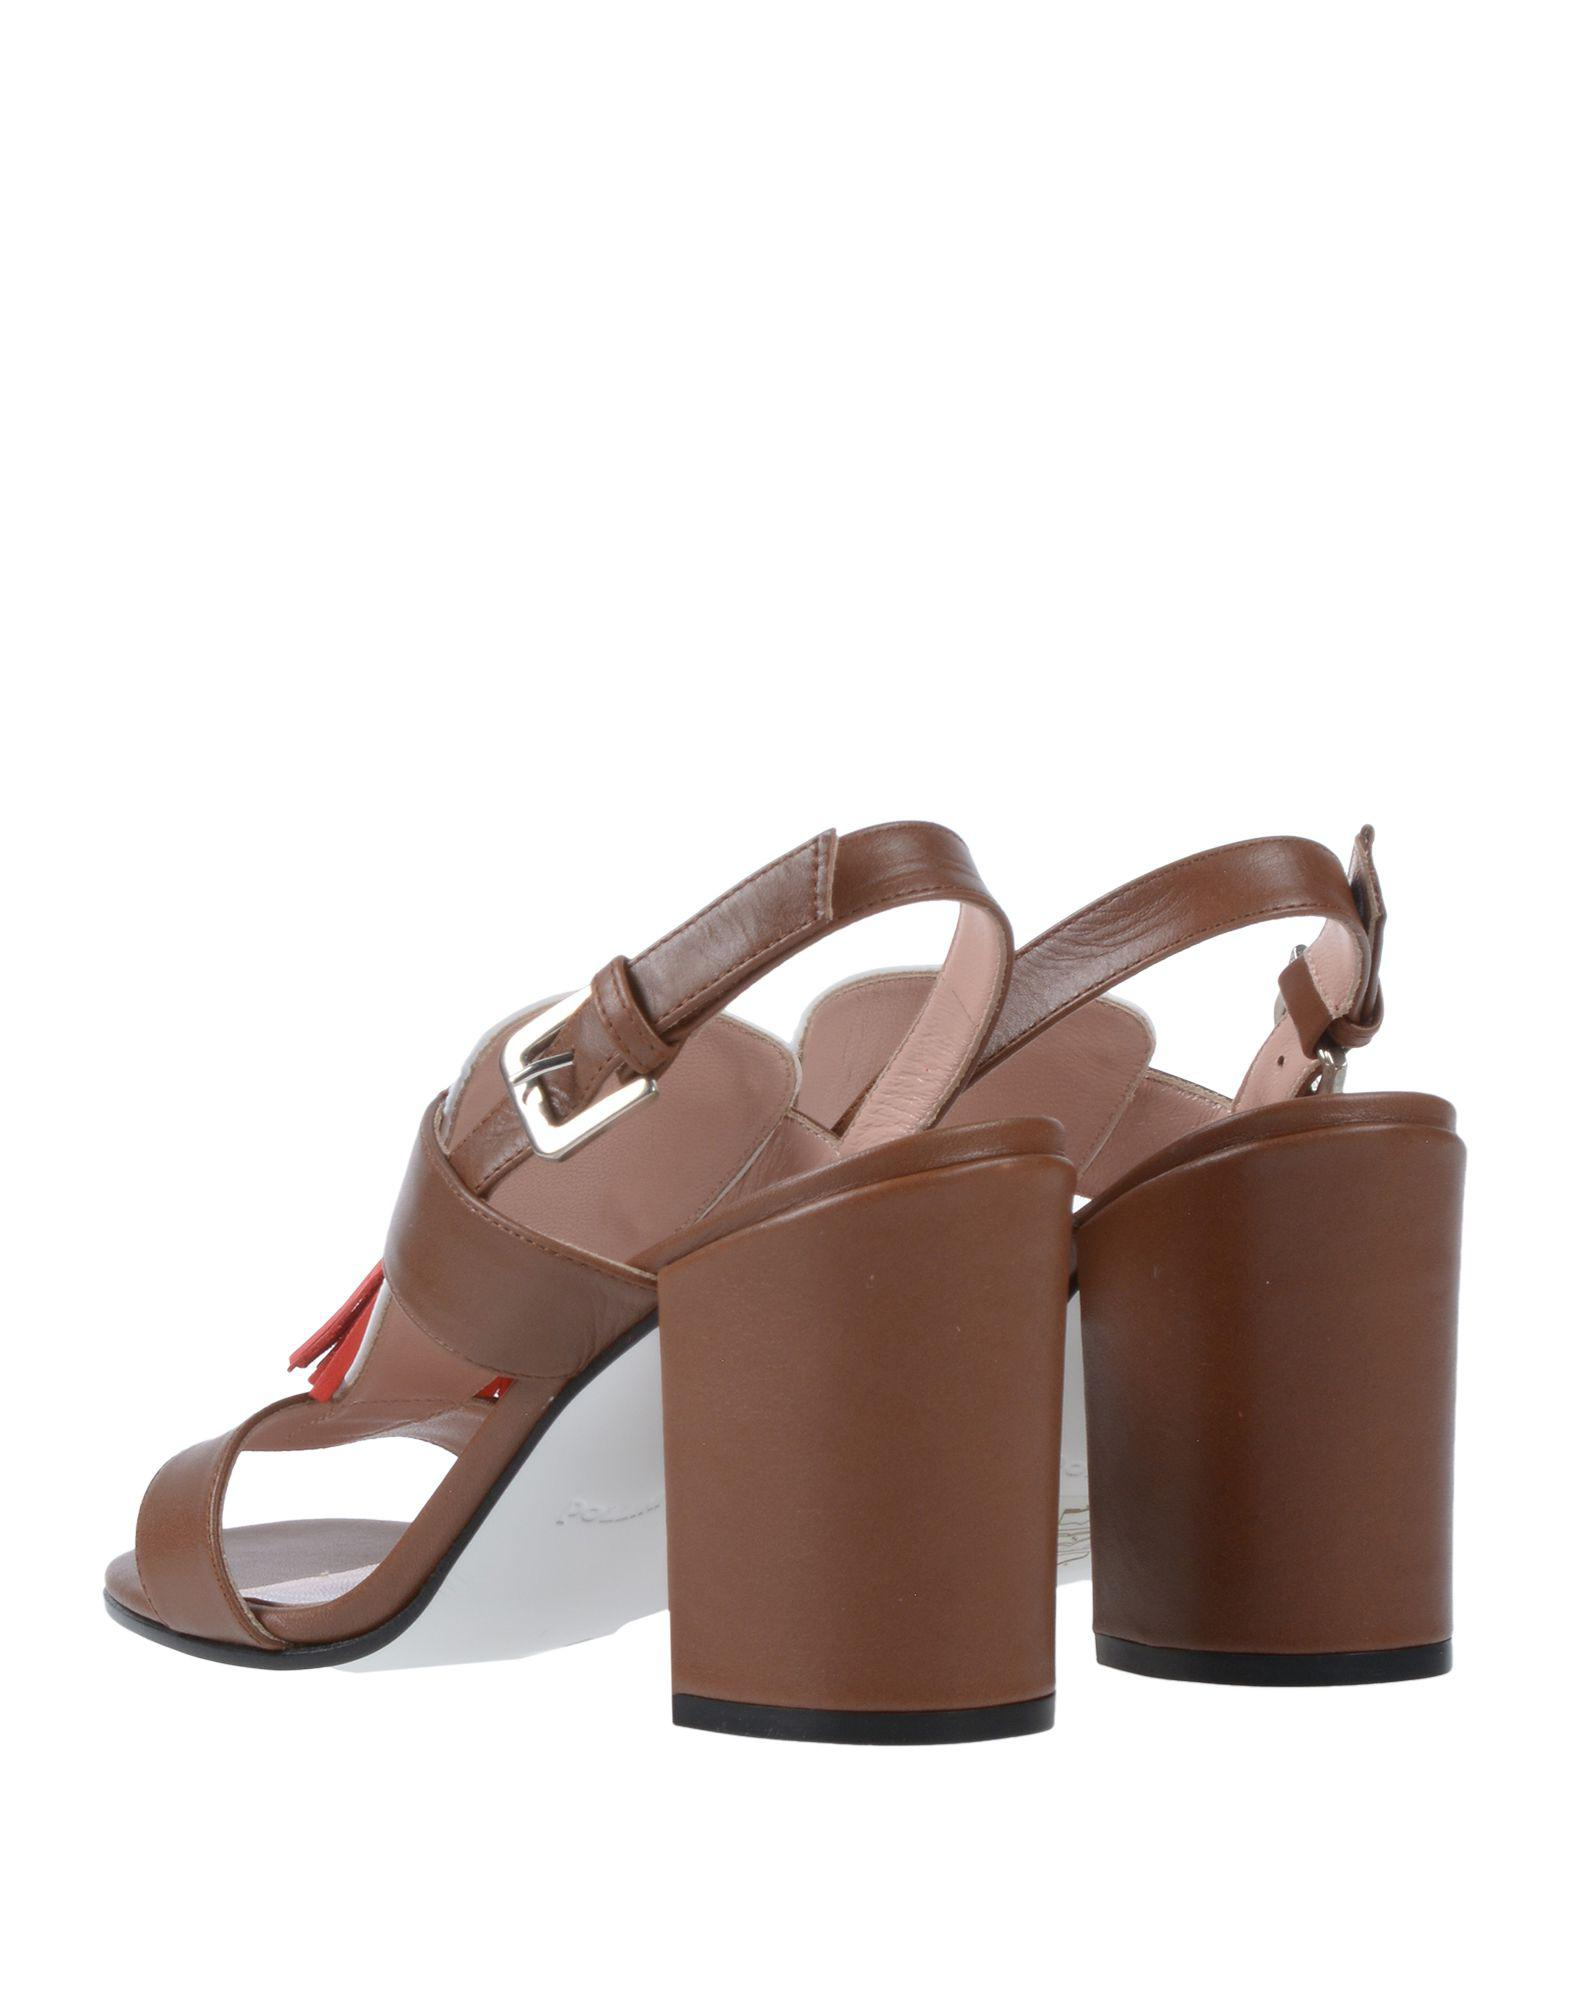 c48c538e5f4 Lyst - Pollini Sandals in Brown